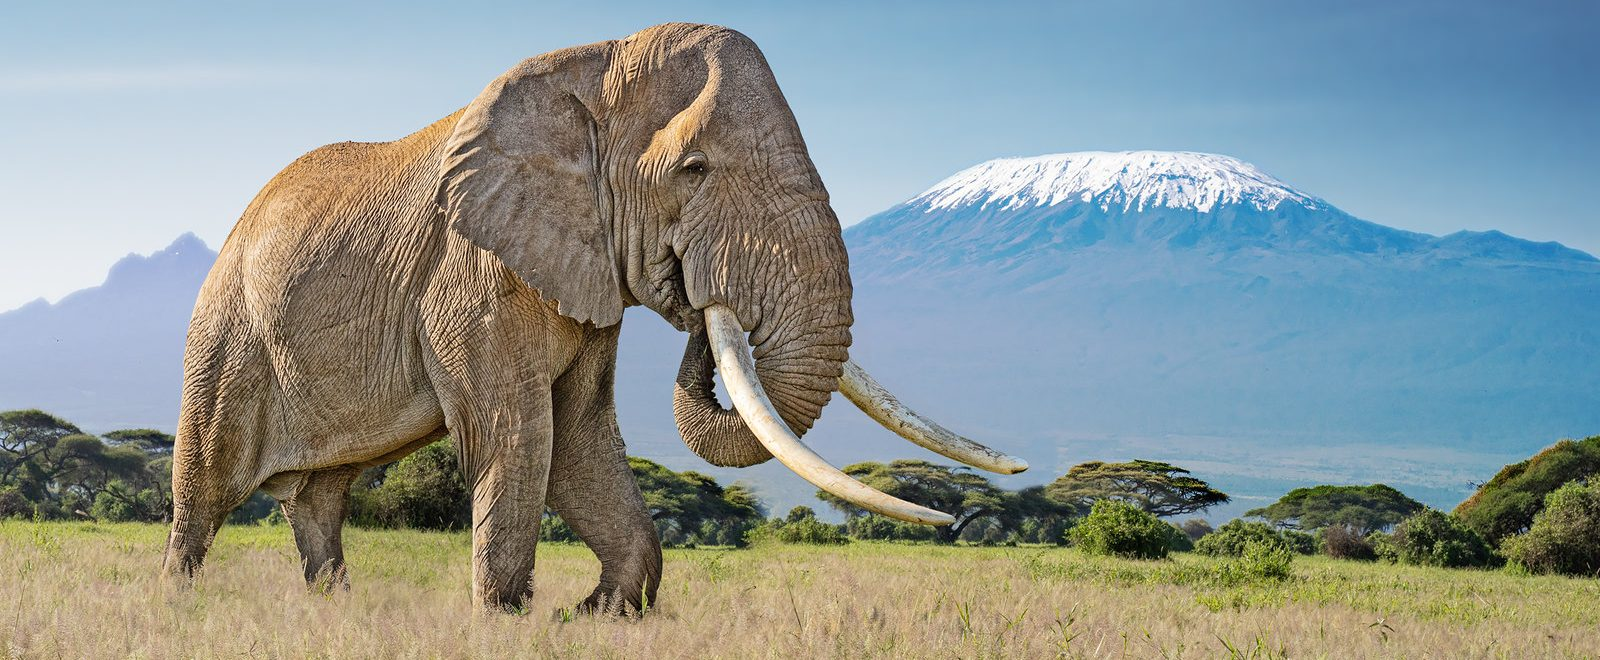 Kilimanjaro view from Amboseli National Park Kenya